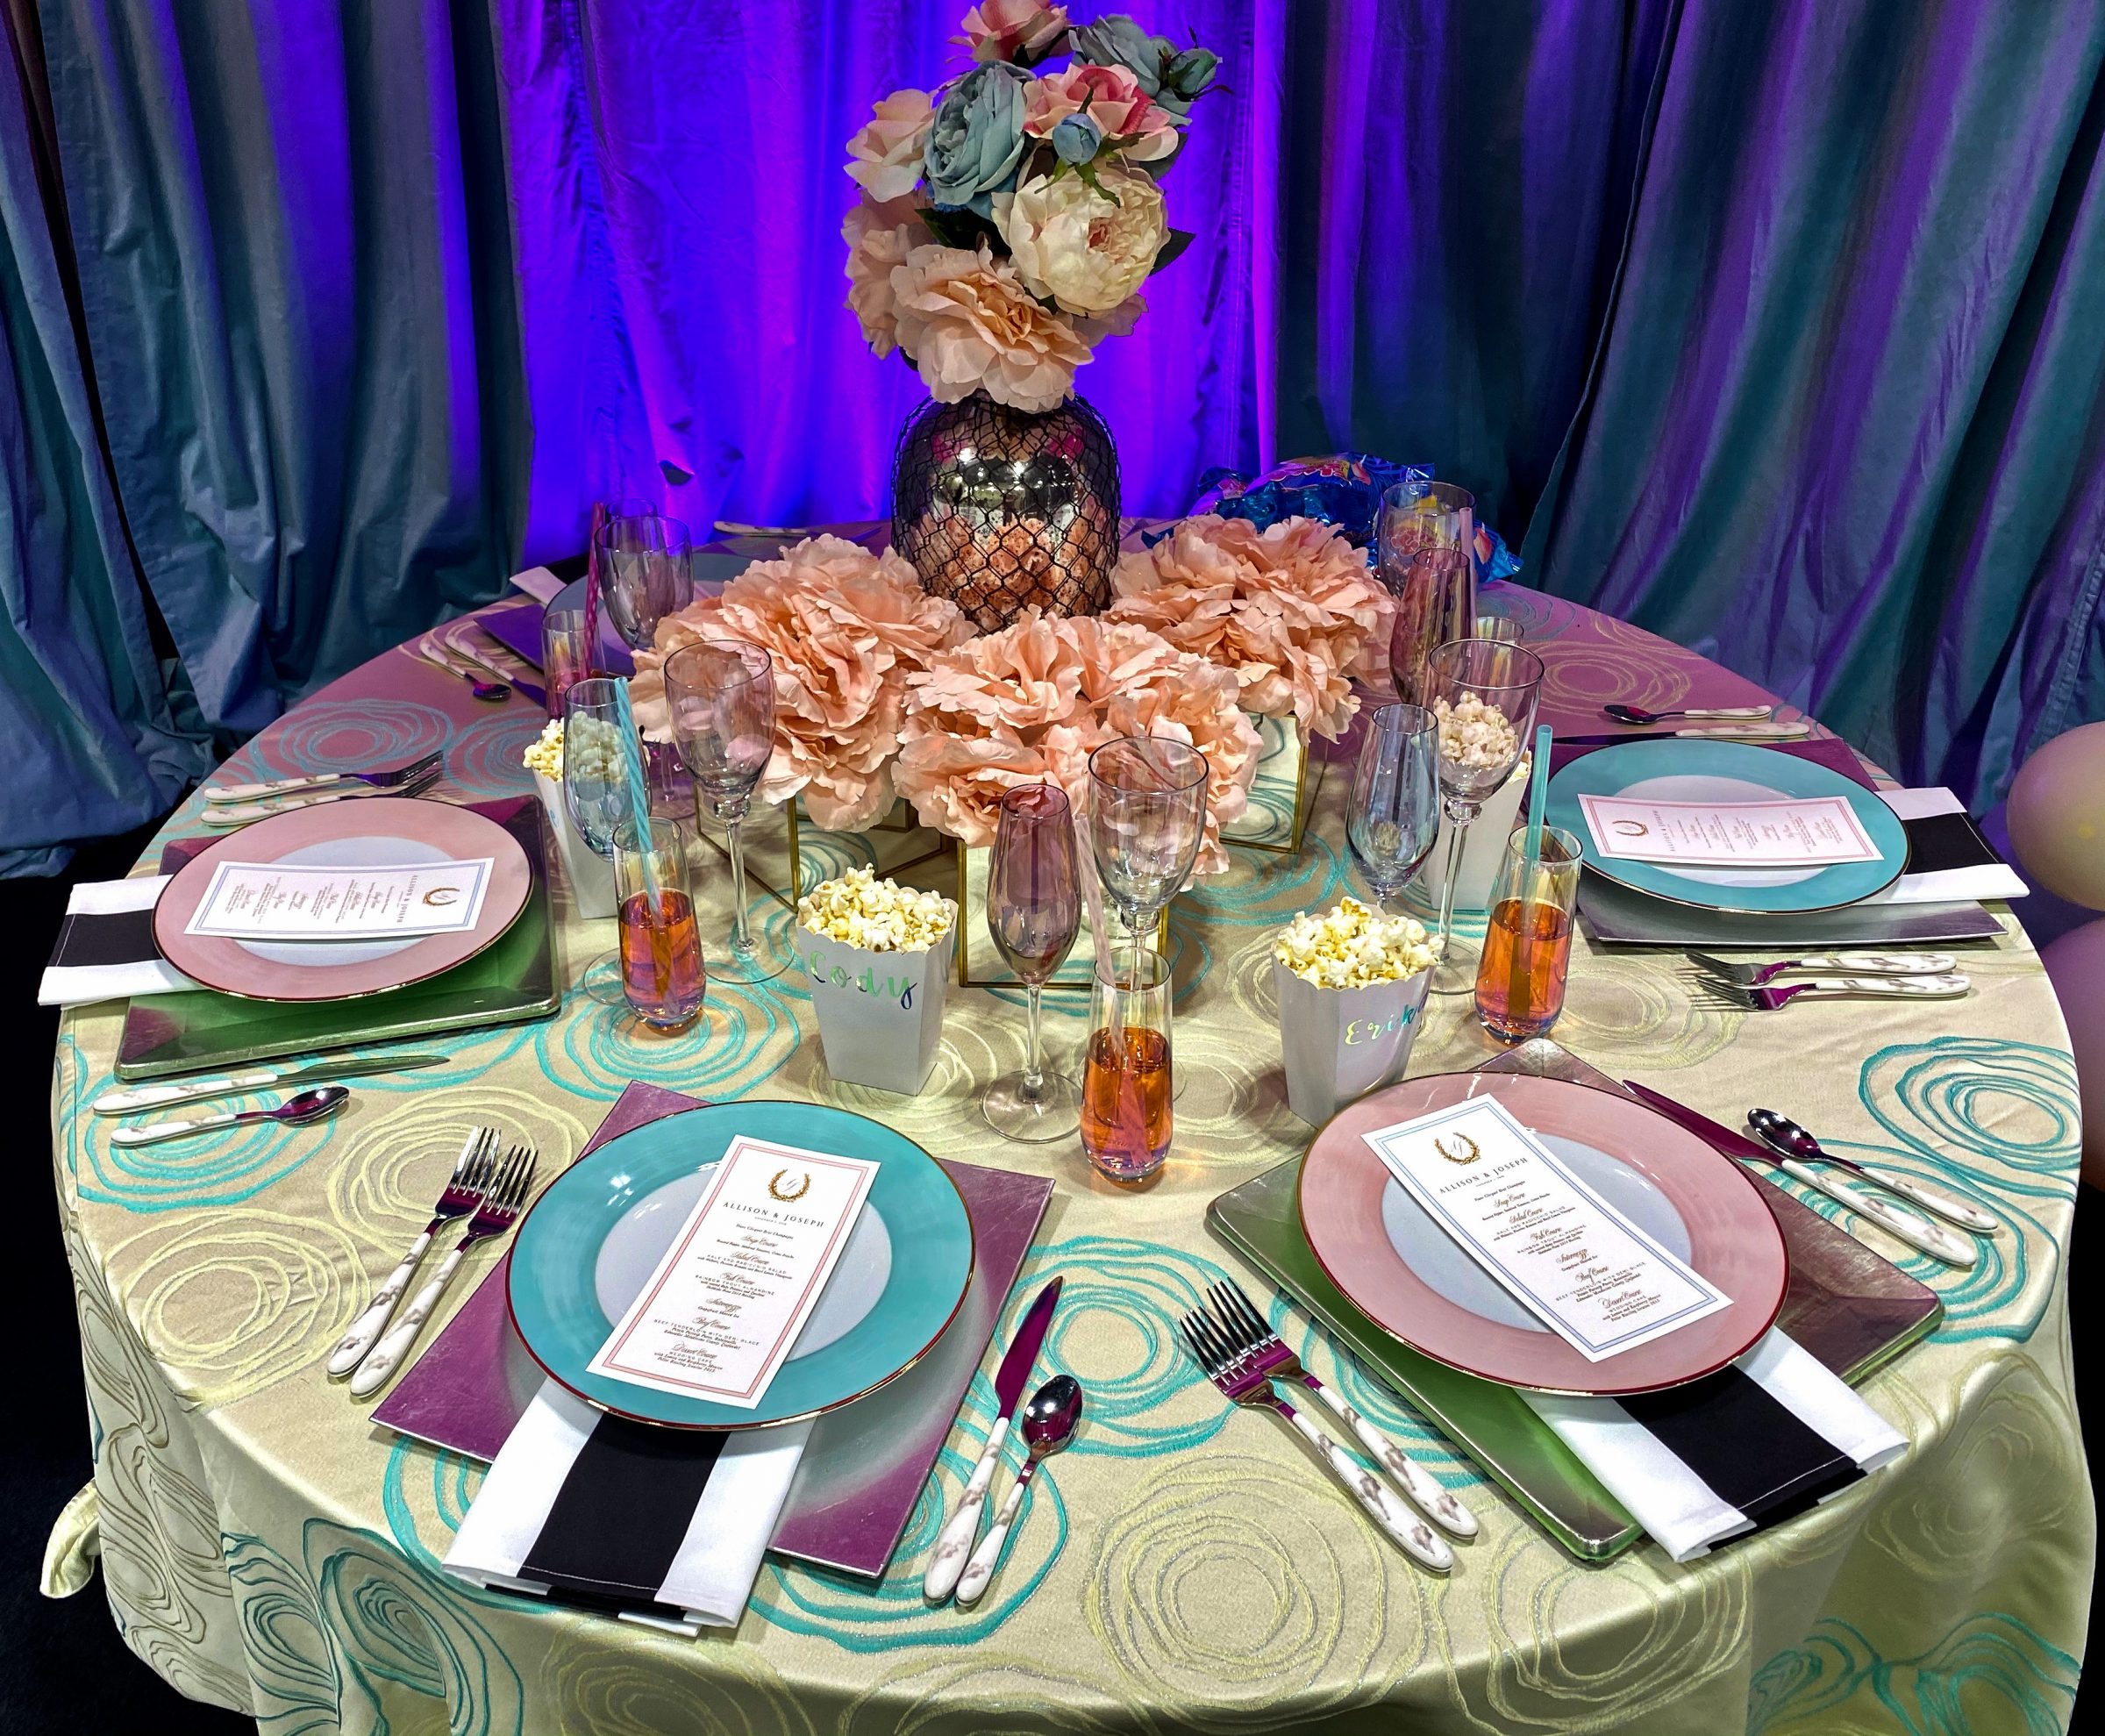 Wedding plates and tabletop decor